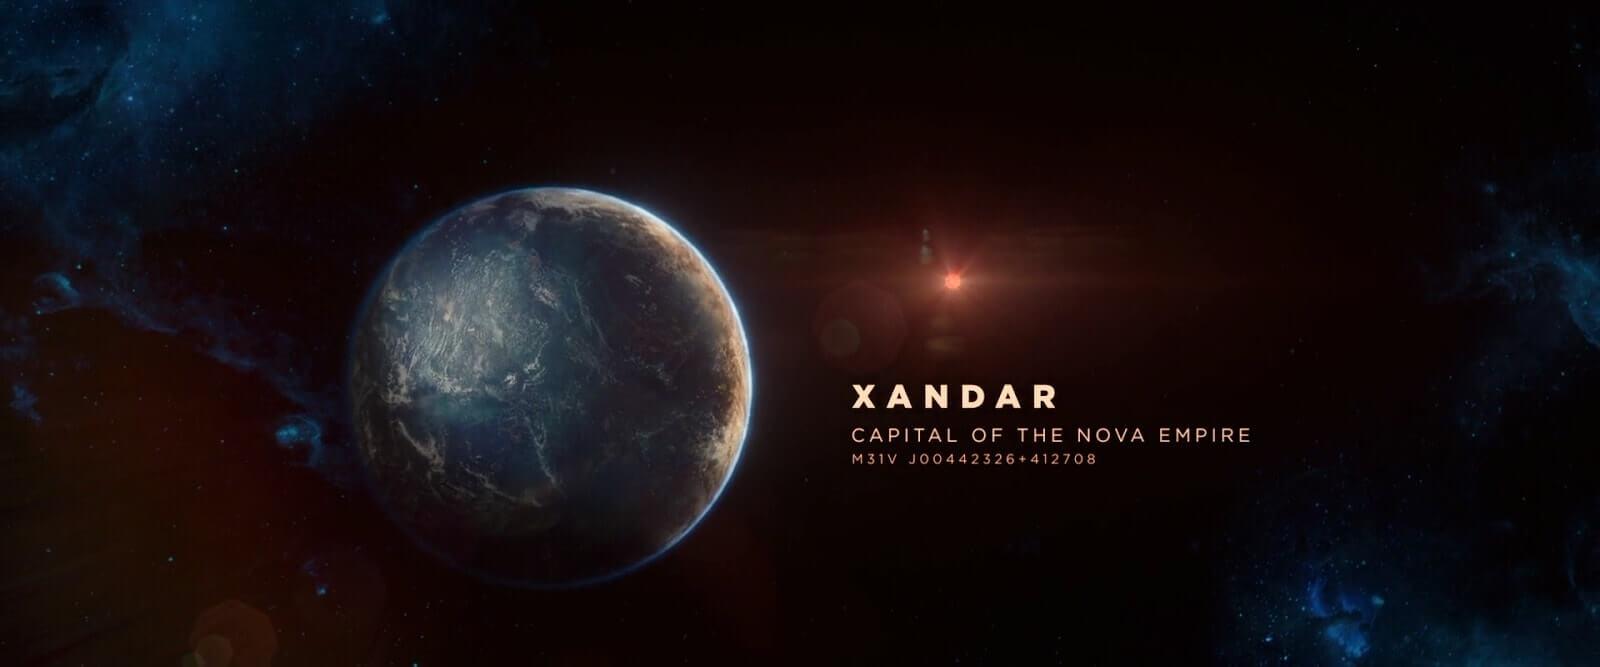 Wide Angle Shot - Camera Movements and Angles- Guardians of the Galaxy - Xandar